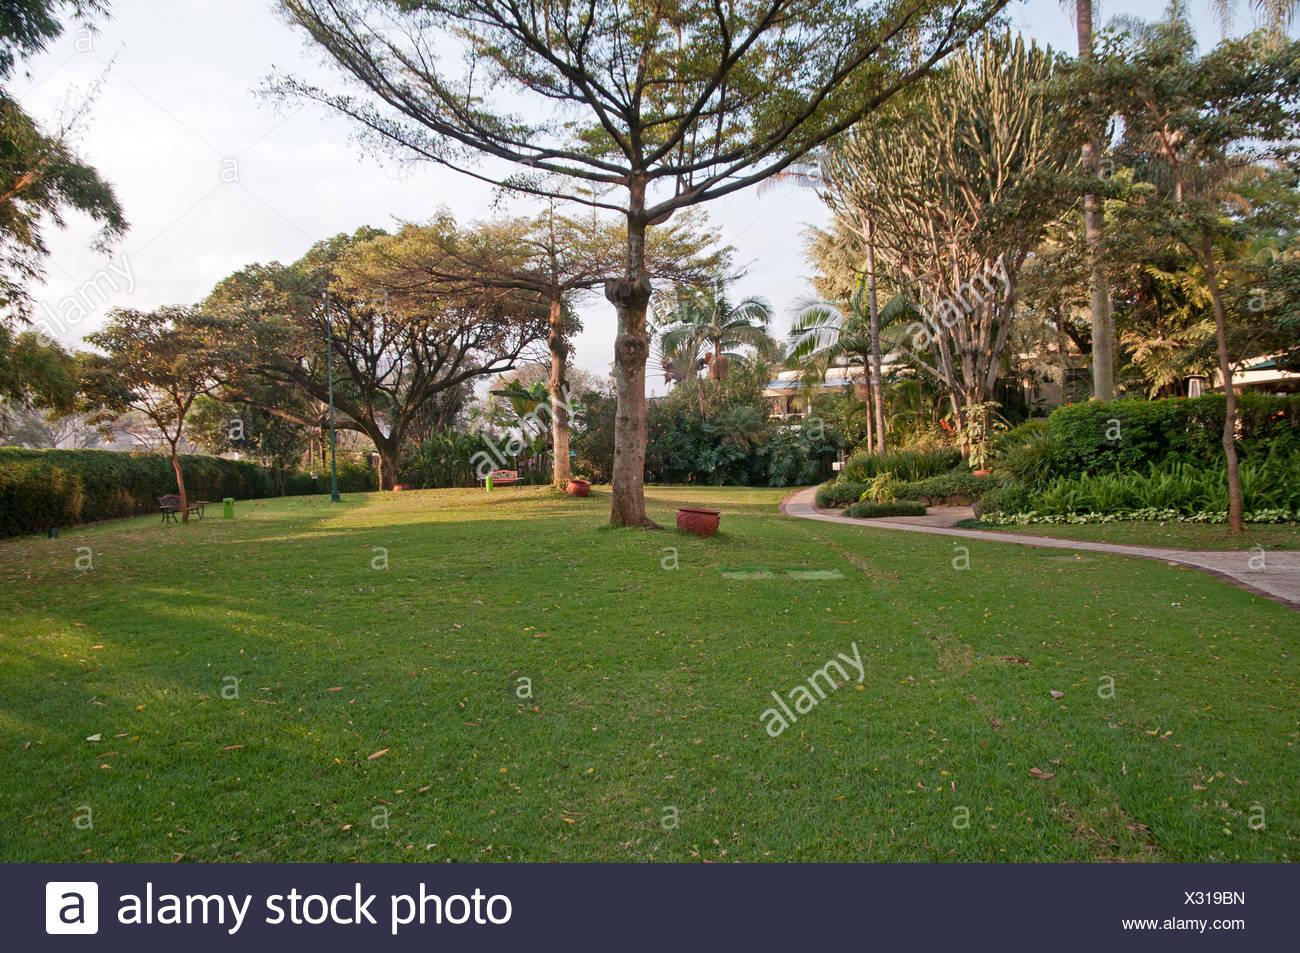 Nairobi Serena Hotel lawns and garden Nairobi Kenya - Stock Image